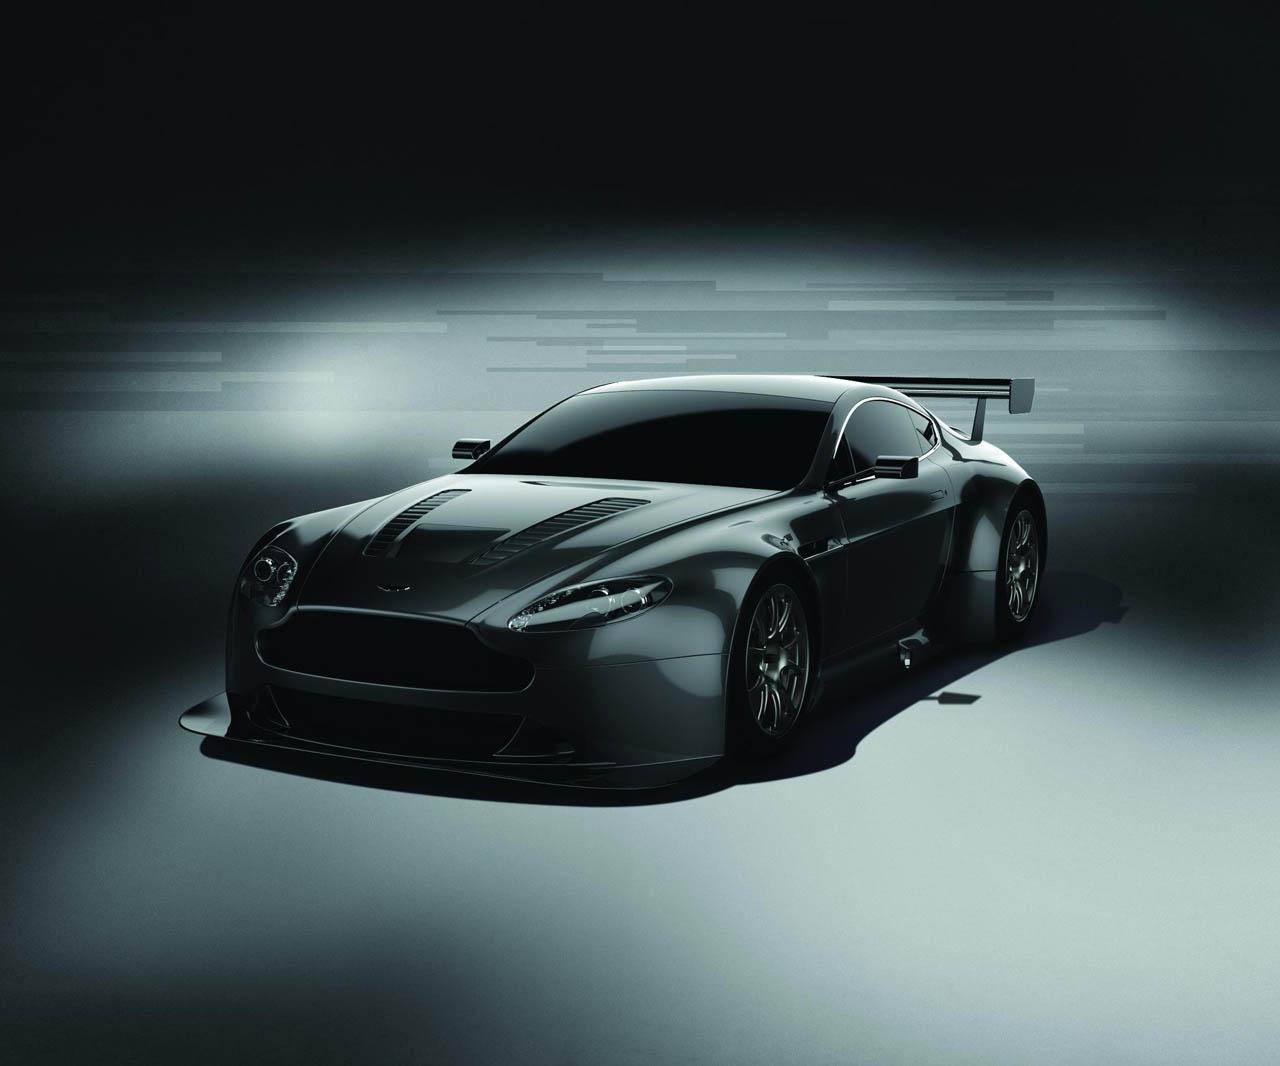 Aston Martin V12 Vantage Gt3 Enters The Scene Automotorblog